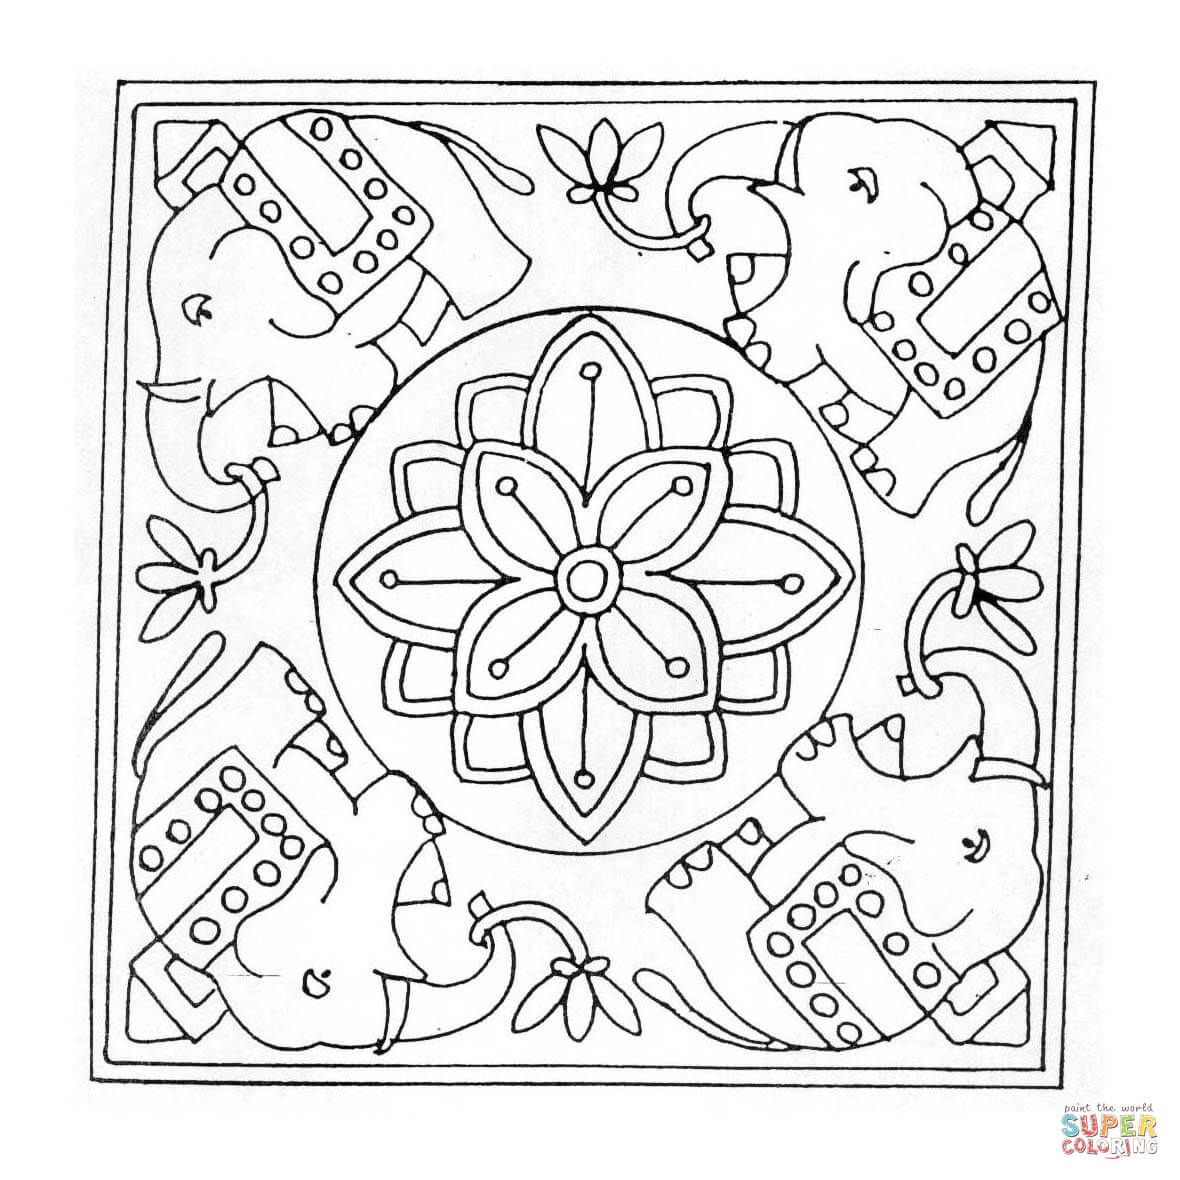 Elephant Mandala coloring page from Square mandalas category. Select ...